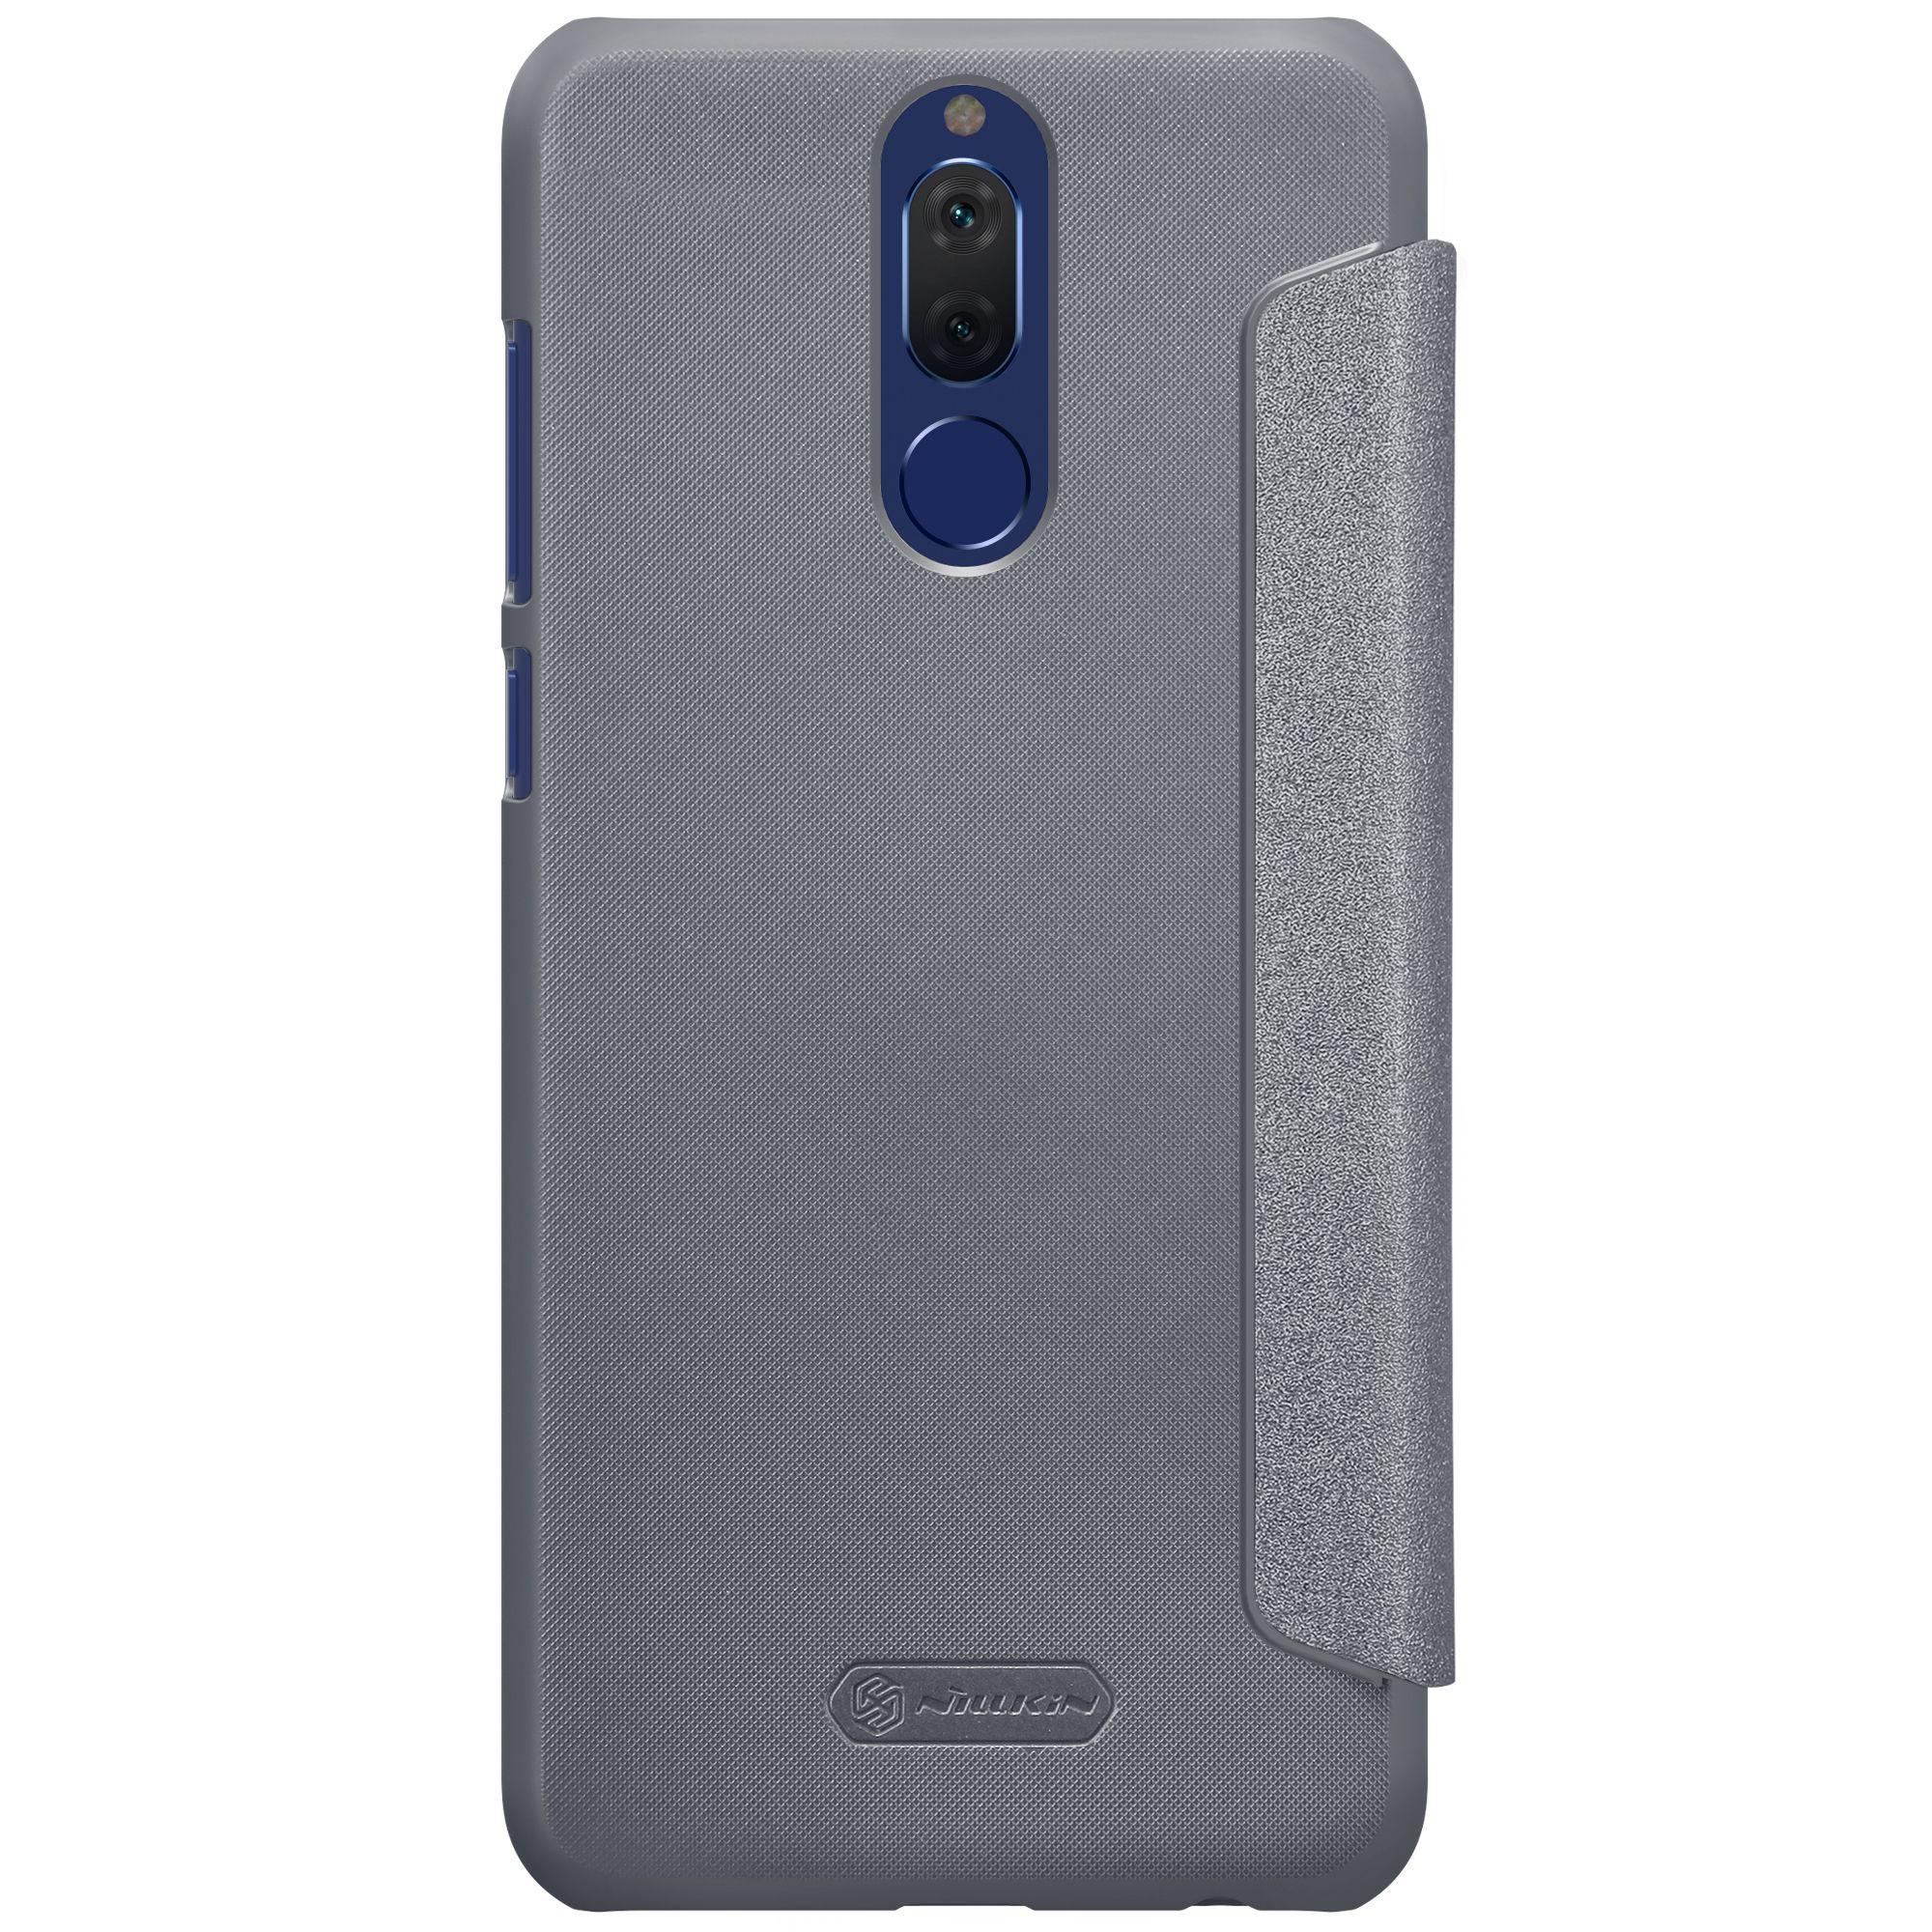 Nillkin Huawei Nova 2i Flip Case Huawei Honor 9i Case Sparkle PU Leather Hard PC Cover Huawei Mate 10 Lite Case Canada 2021 From Nillkinstore, CAD ...